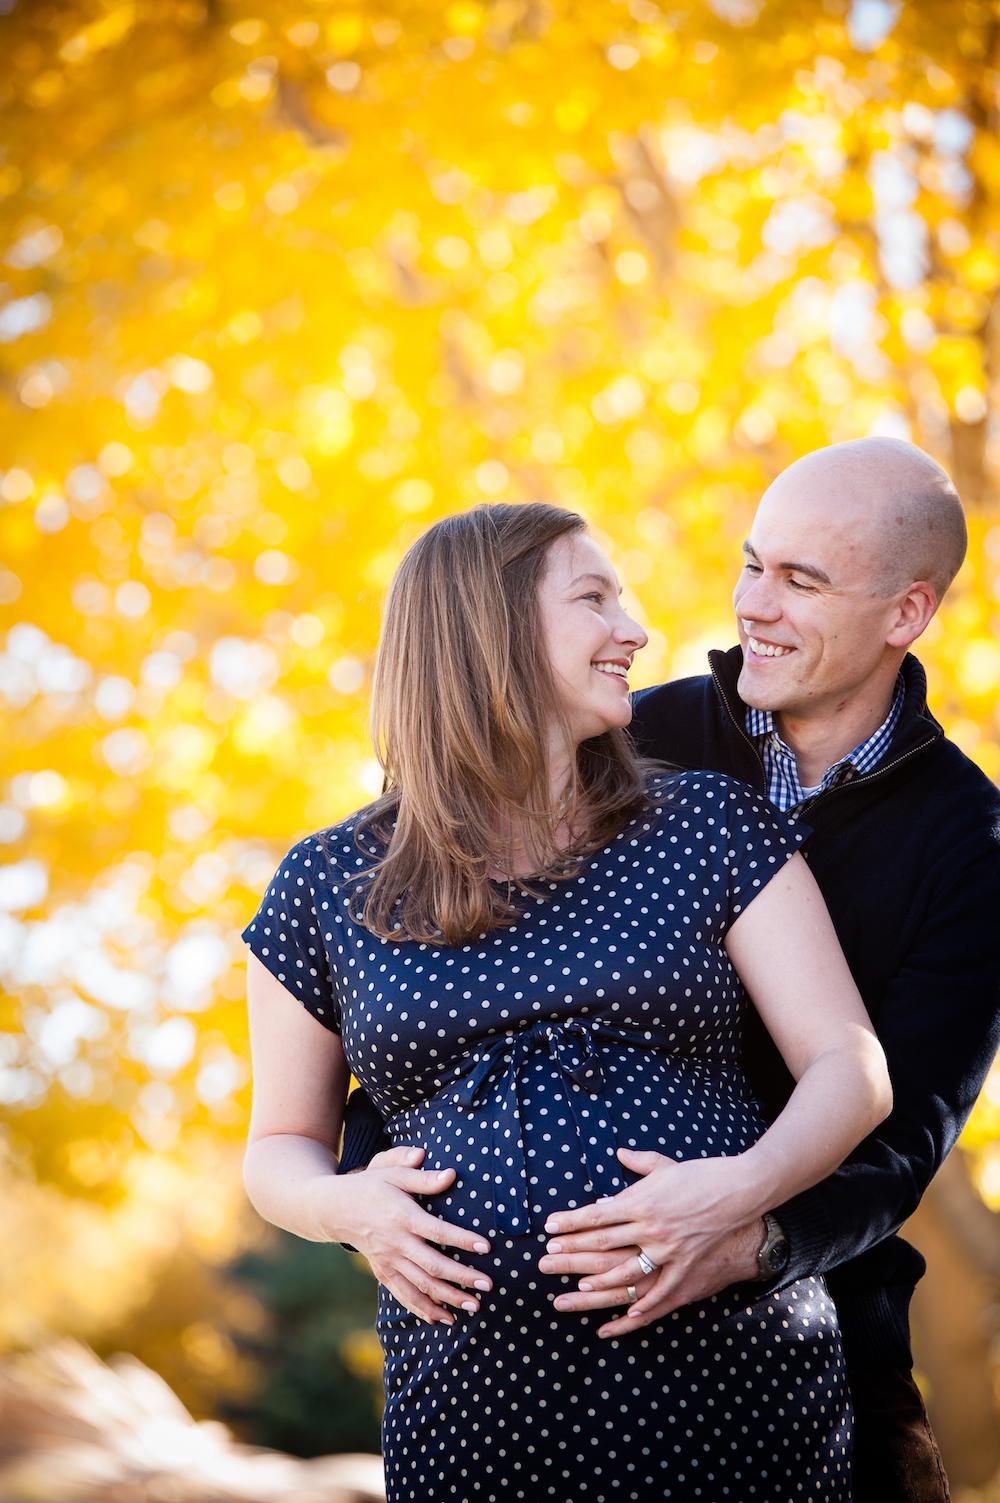 ck-Colorado-Maternity-Baby-Photography-0006.jpg